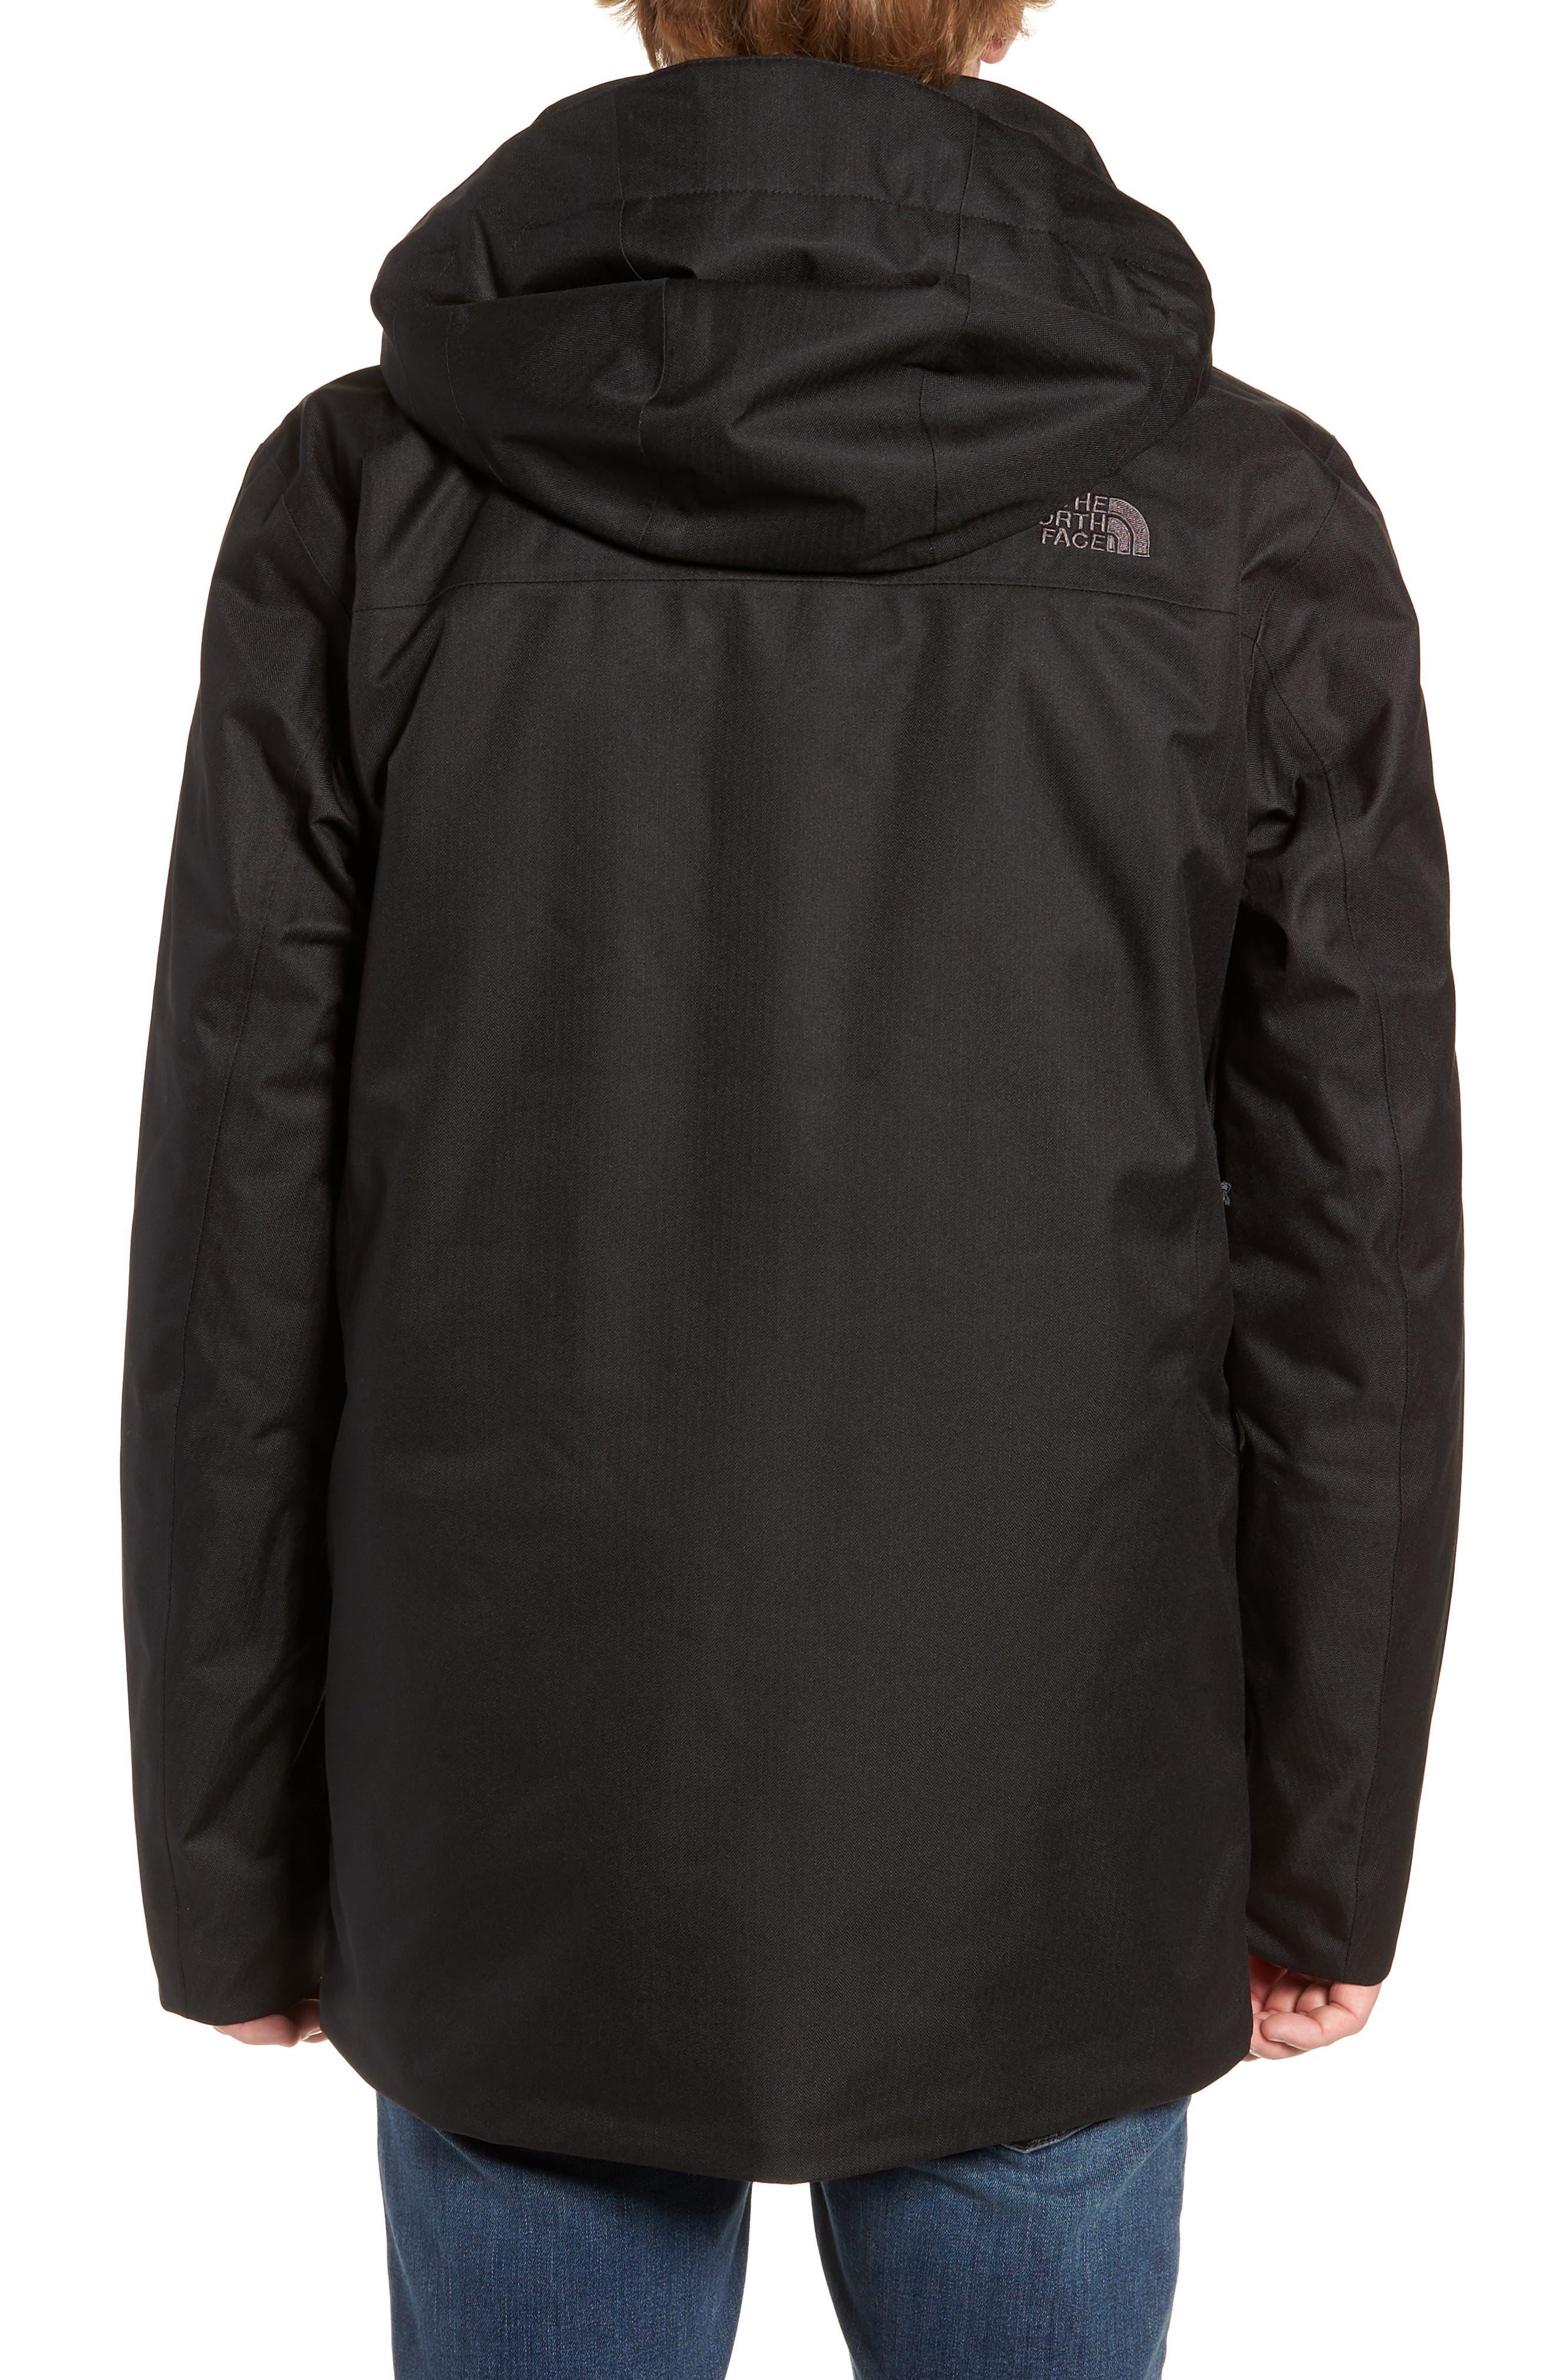 THE NORTH FACE, Gatekeeper Waterproof Jacket, Alternate thumbnail 2, color, 005